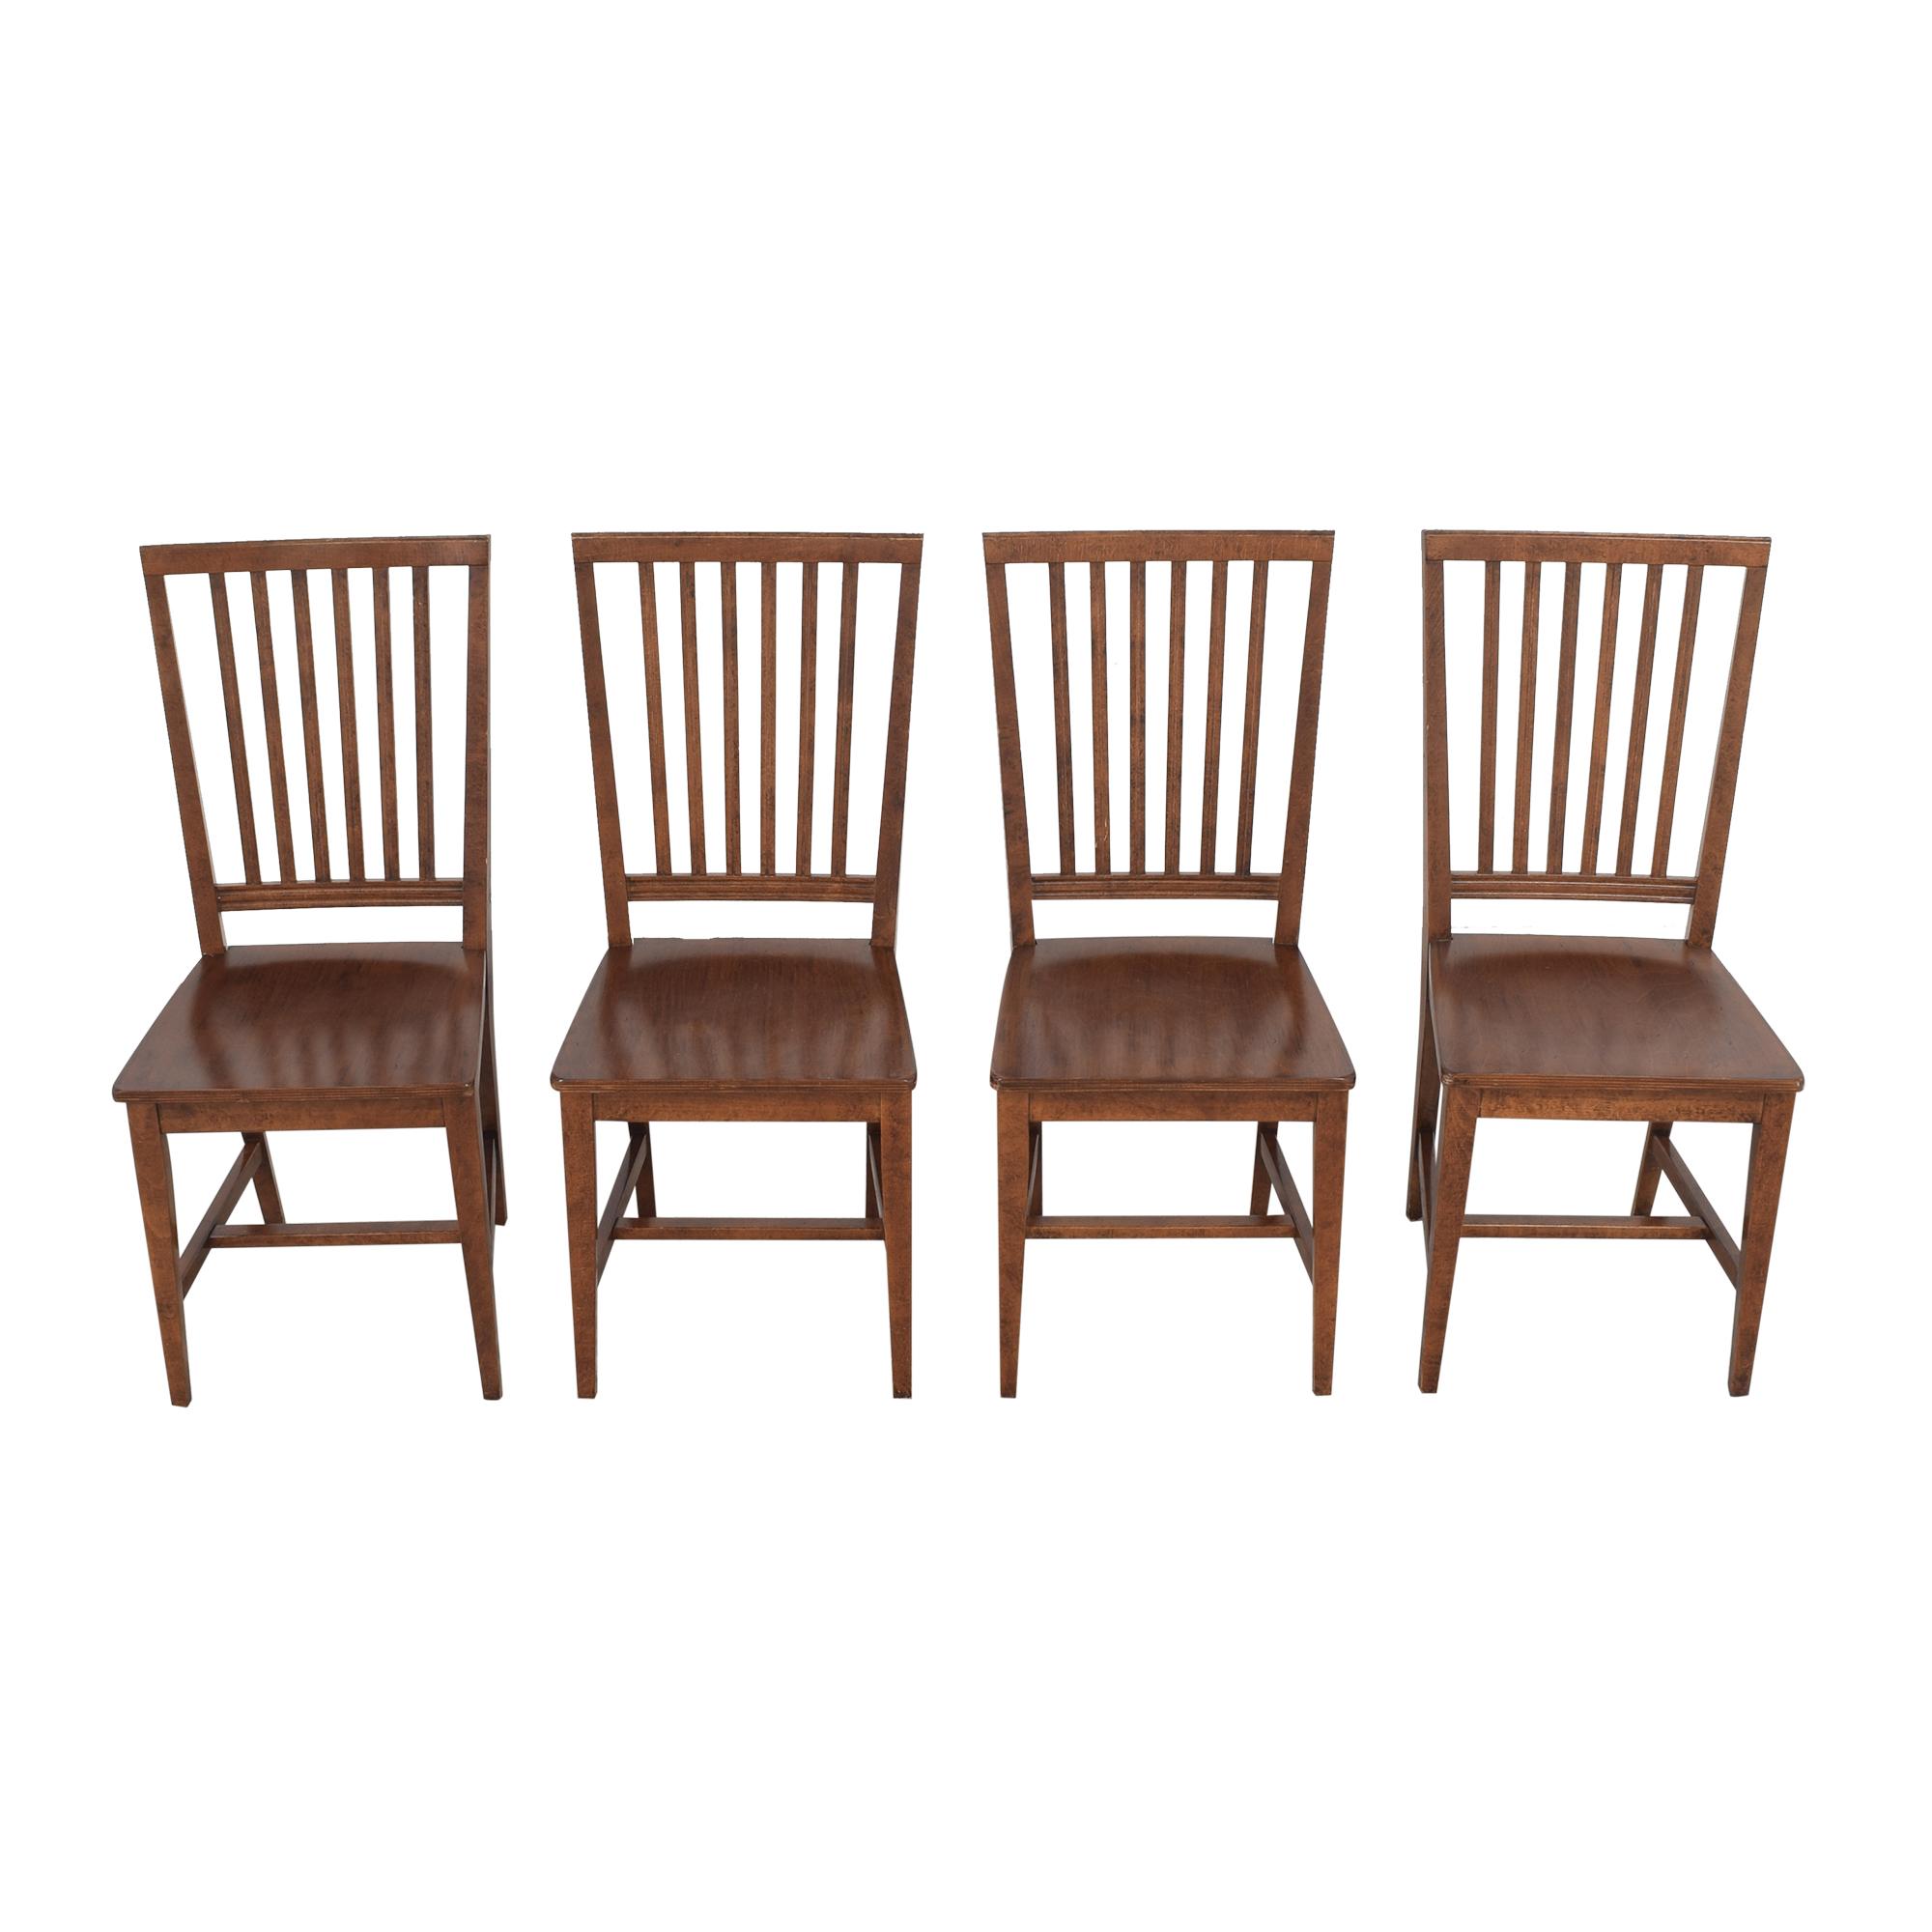 shop Crate & Barrel Crate & Barrel Village Nero Noche Dining Chairs online